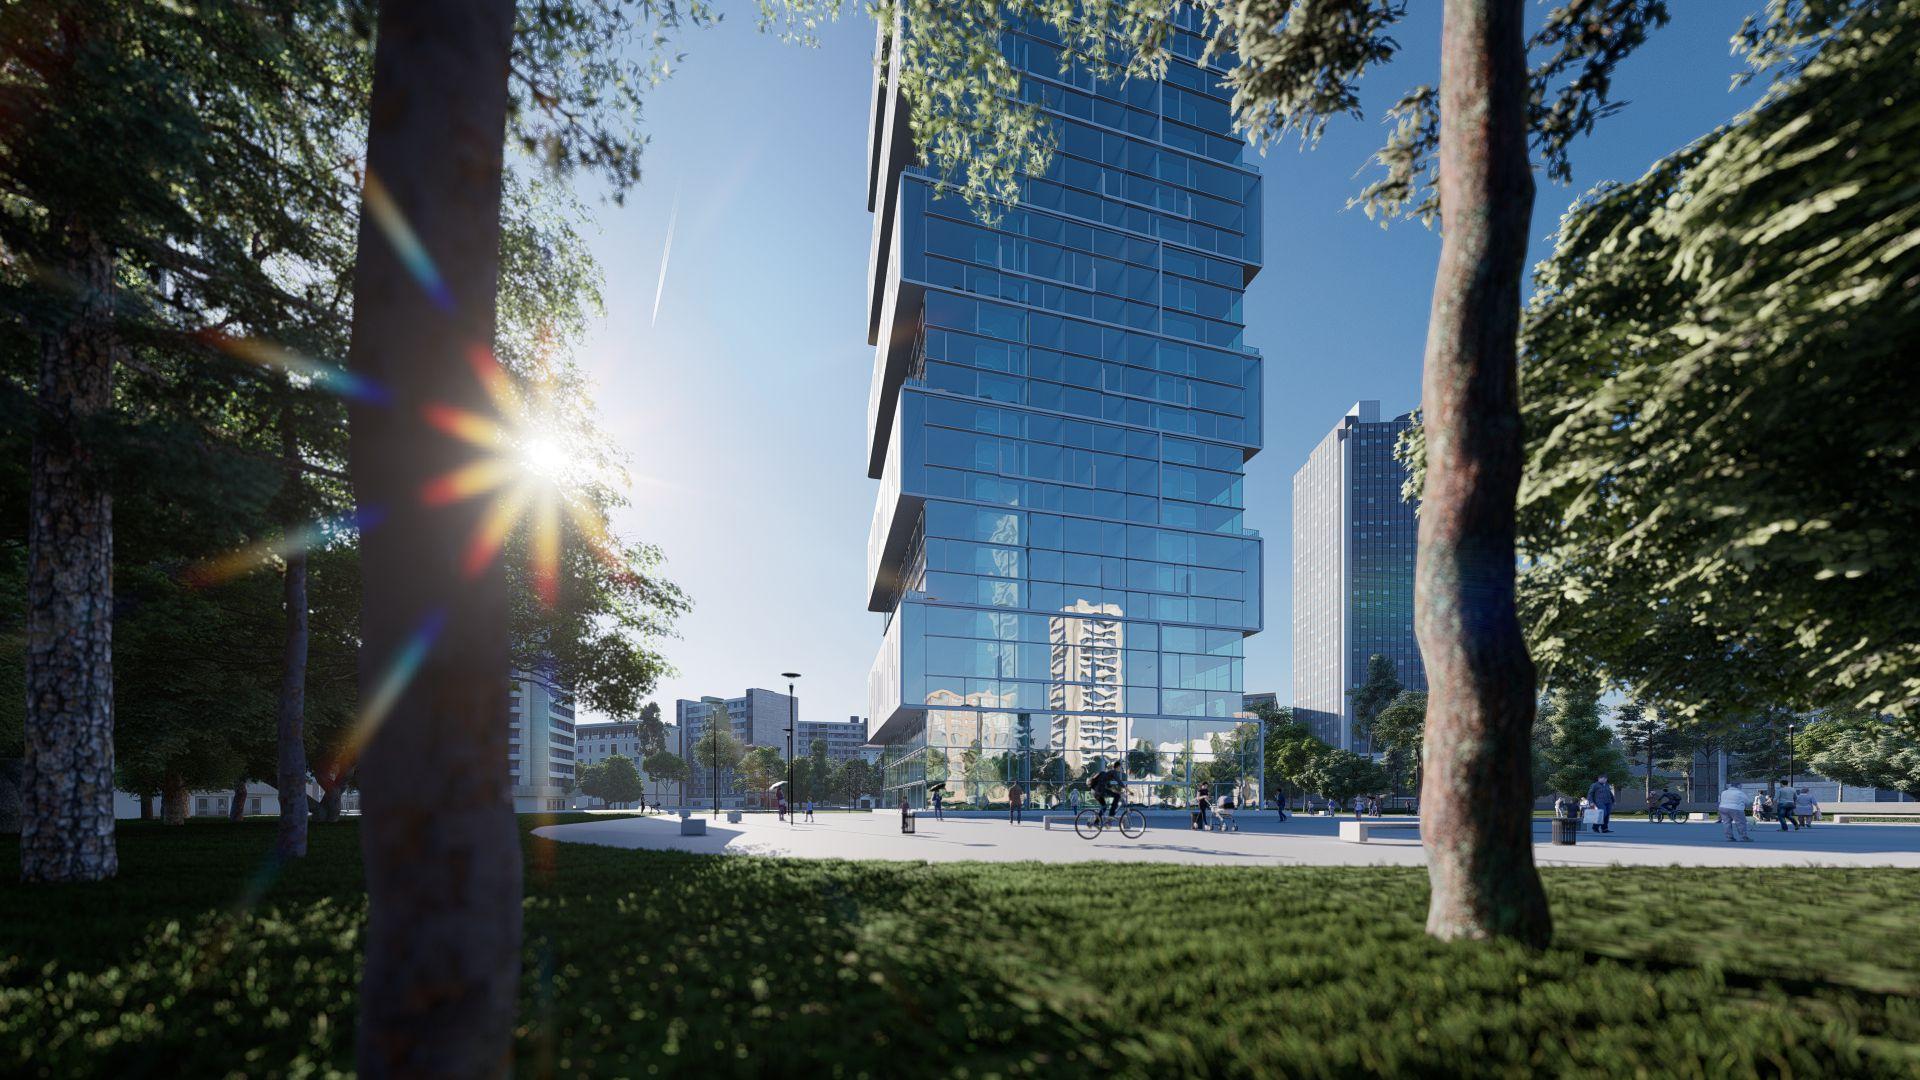 arhitektuurne 3d visualiseerimine pilve hoone 26